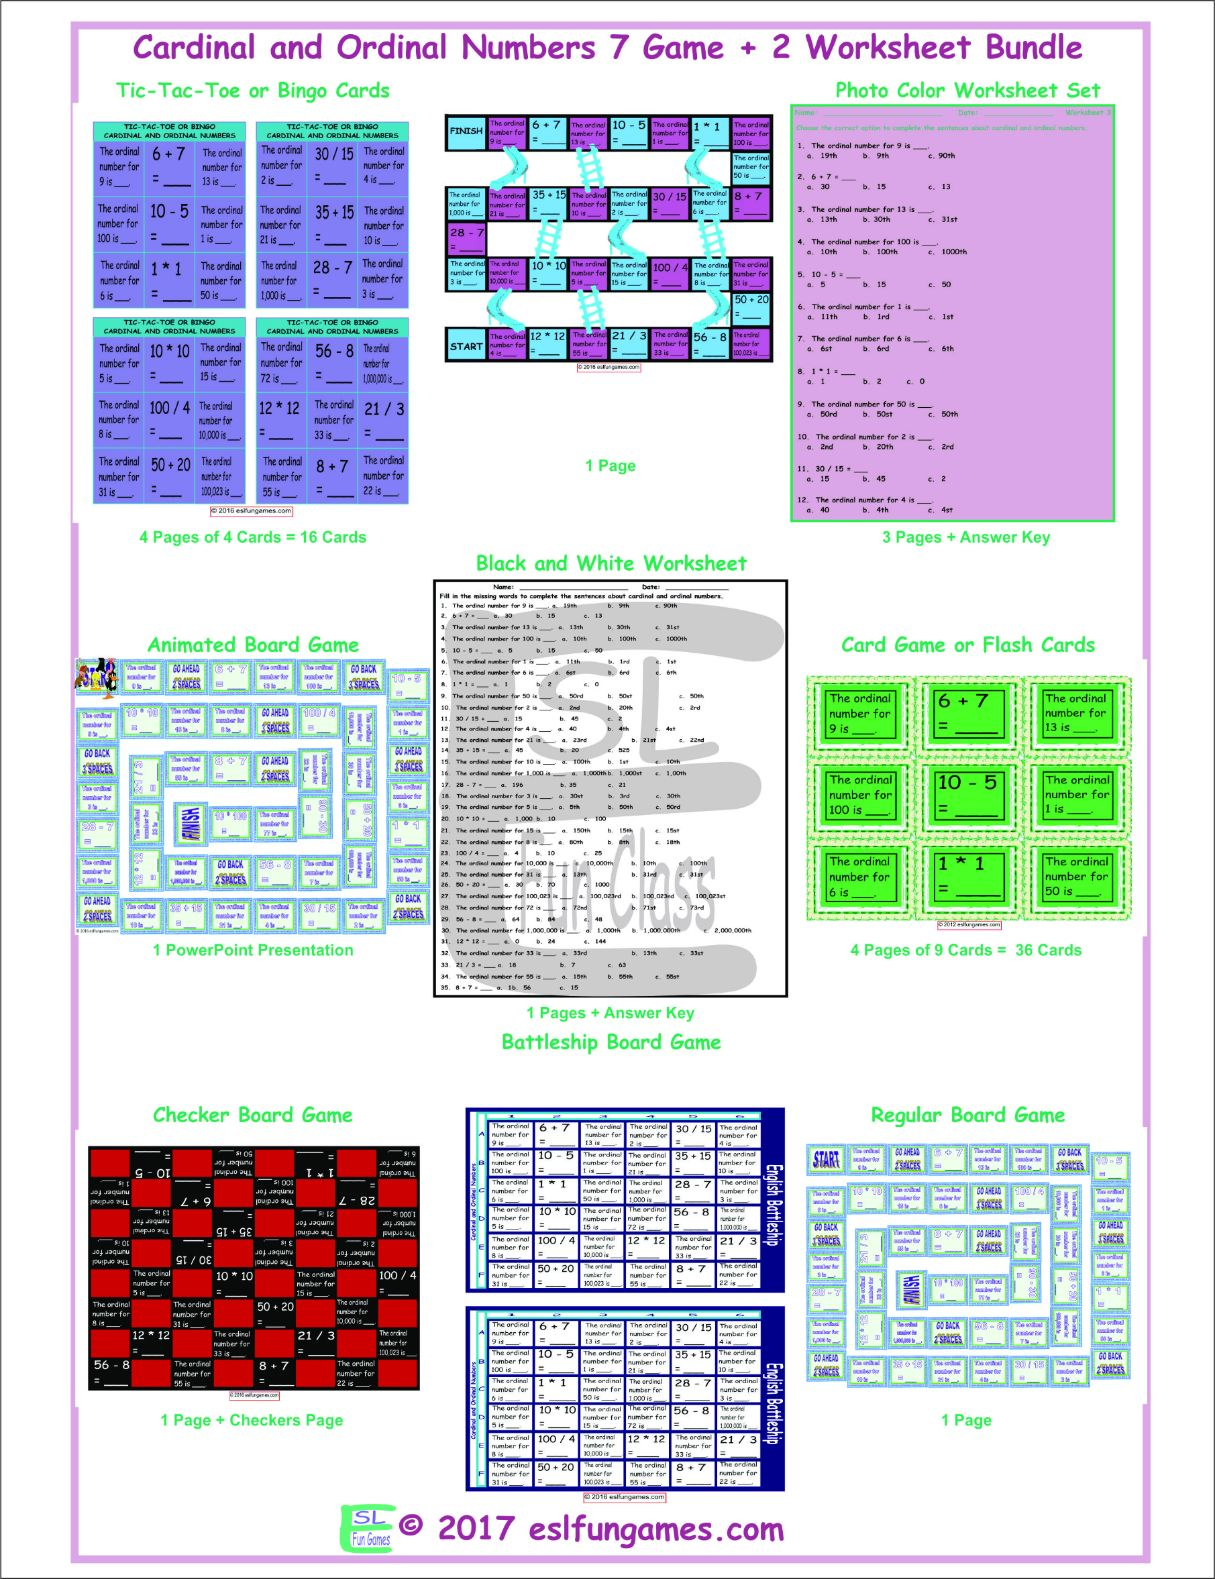 Cardinal and Ordinal Numbers 7 Game Plus 2 Worksheet Bundle